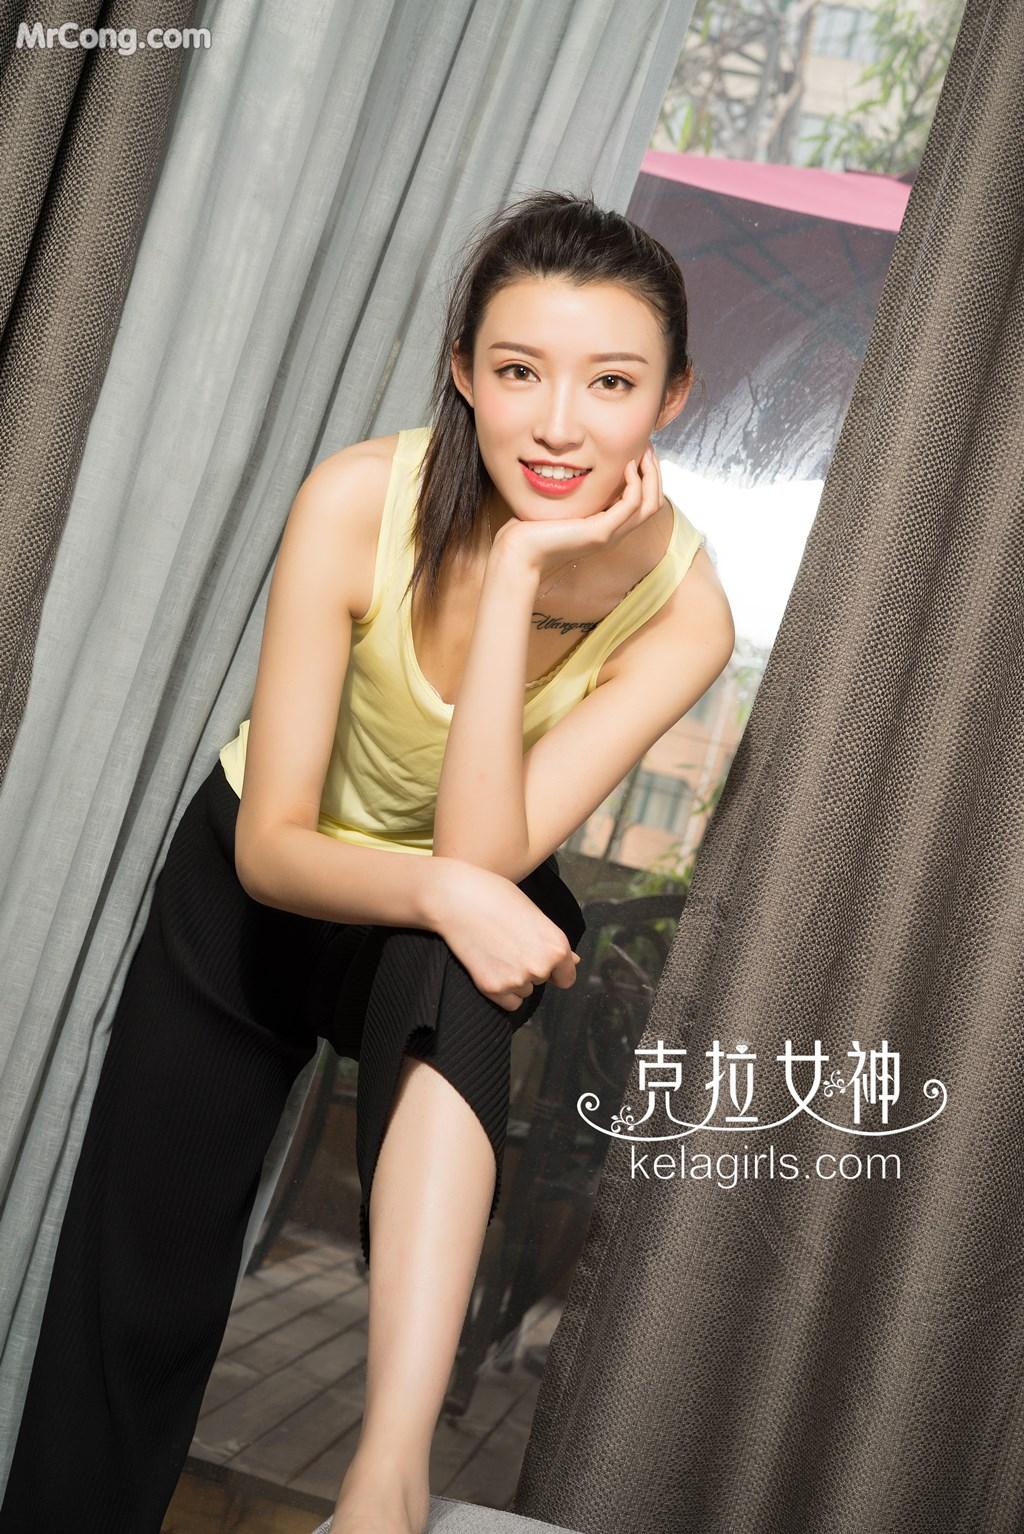 Image KelaGirls-2017-08-09-Zhao-Yujing-MrCong.com-006 in post KelaGirls 2017-08-09: Người mẫu Zhao Yujing (赵雨静) (21 ảnh)